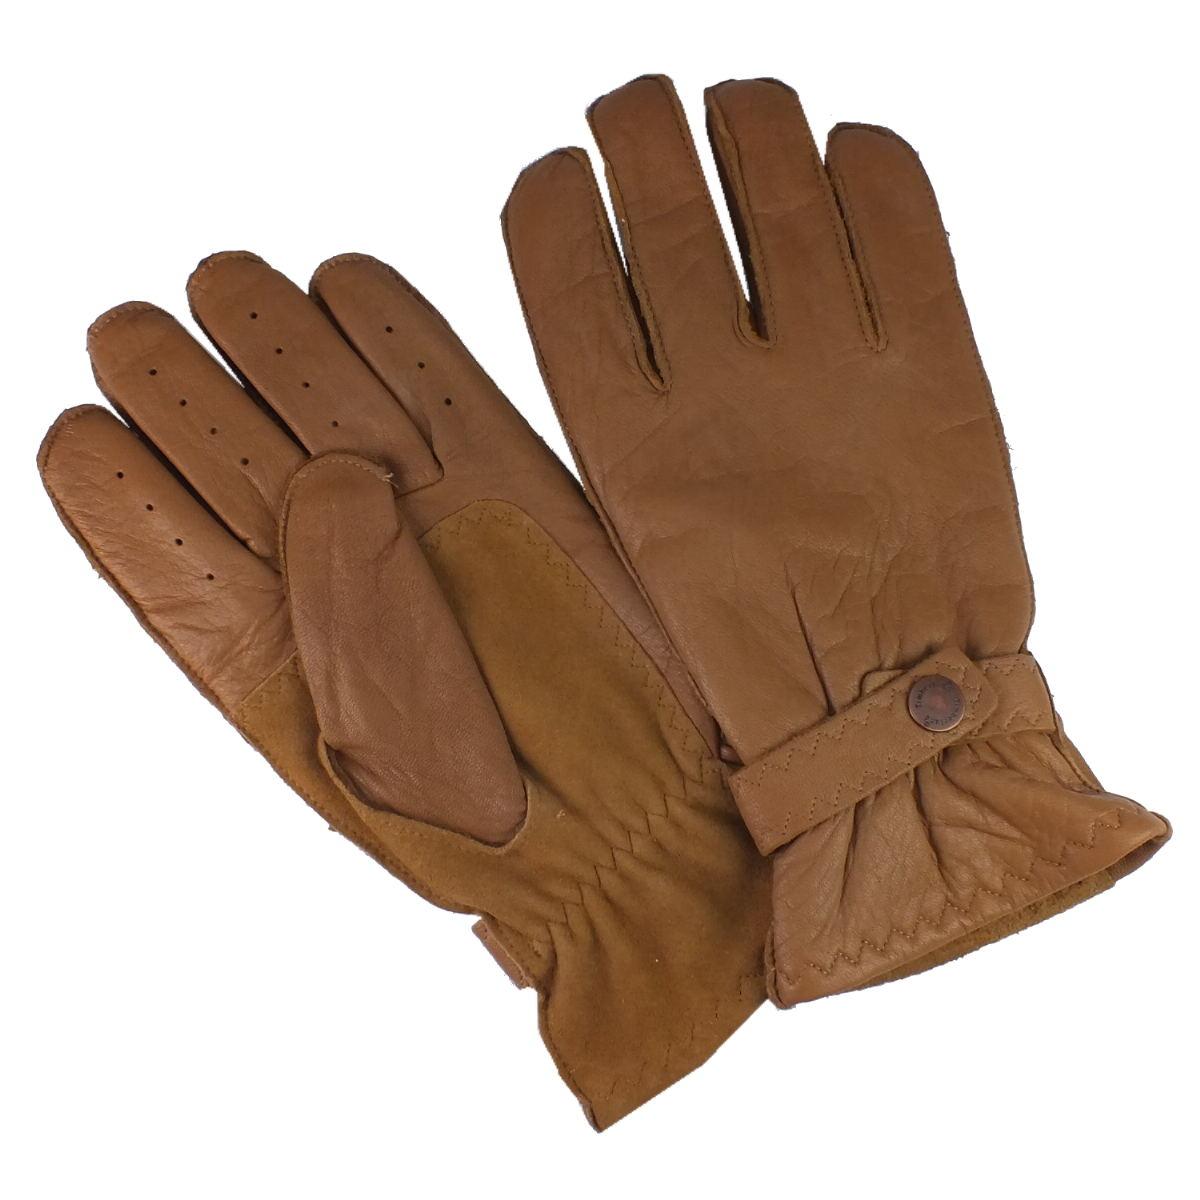 timberland raycroft deerskin drving gloves handschuhe leder herren braun schwarz ebay. Black Bedroom Furniture Sets. Home Design Ideas